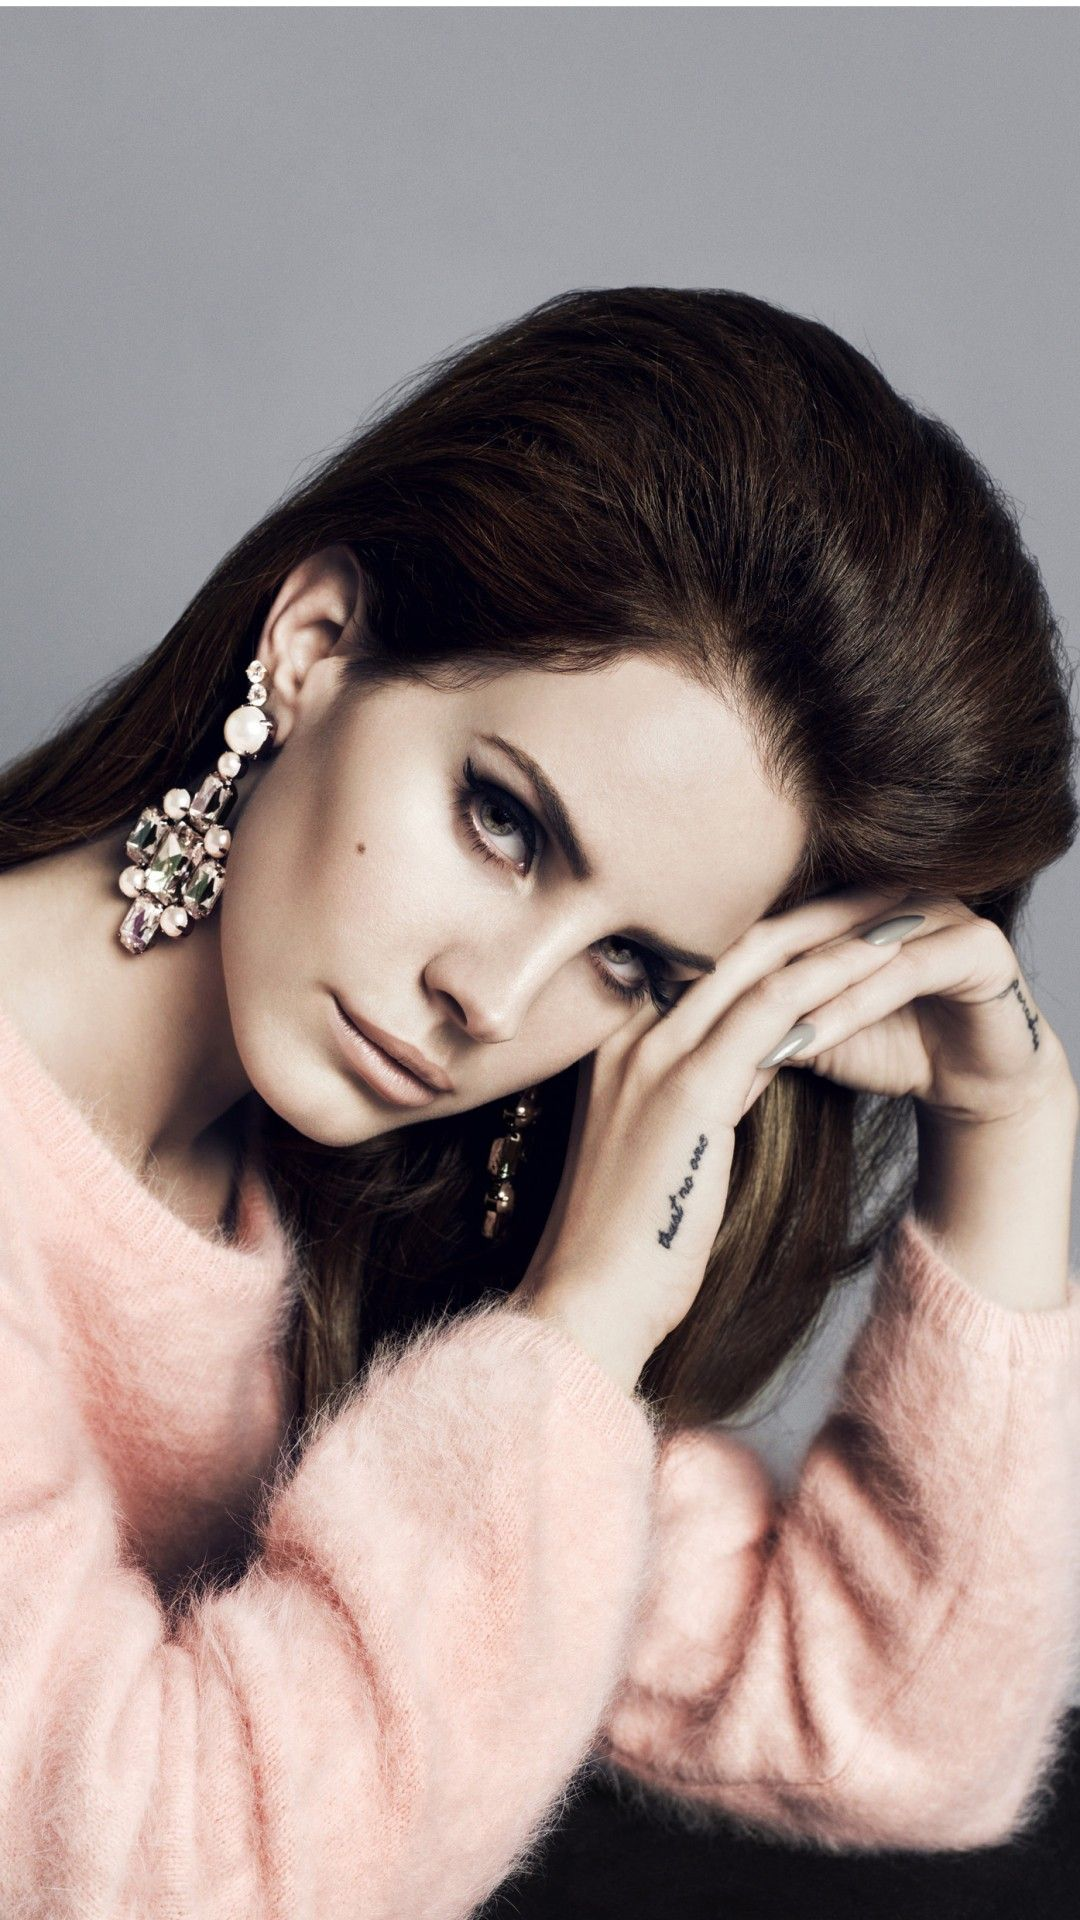 Wallpaper Phone Lana Del Rey Full Hd Lana Del Rey Lana Rey